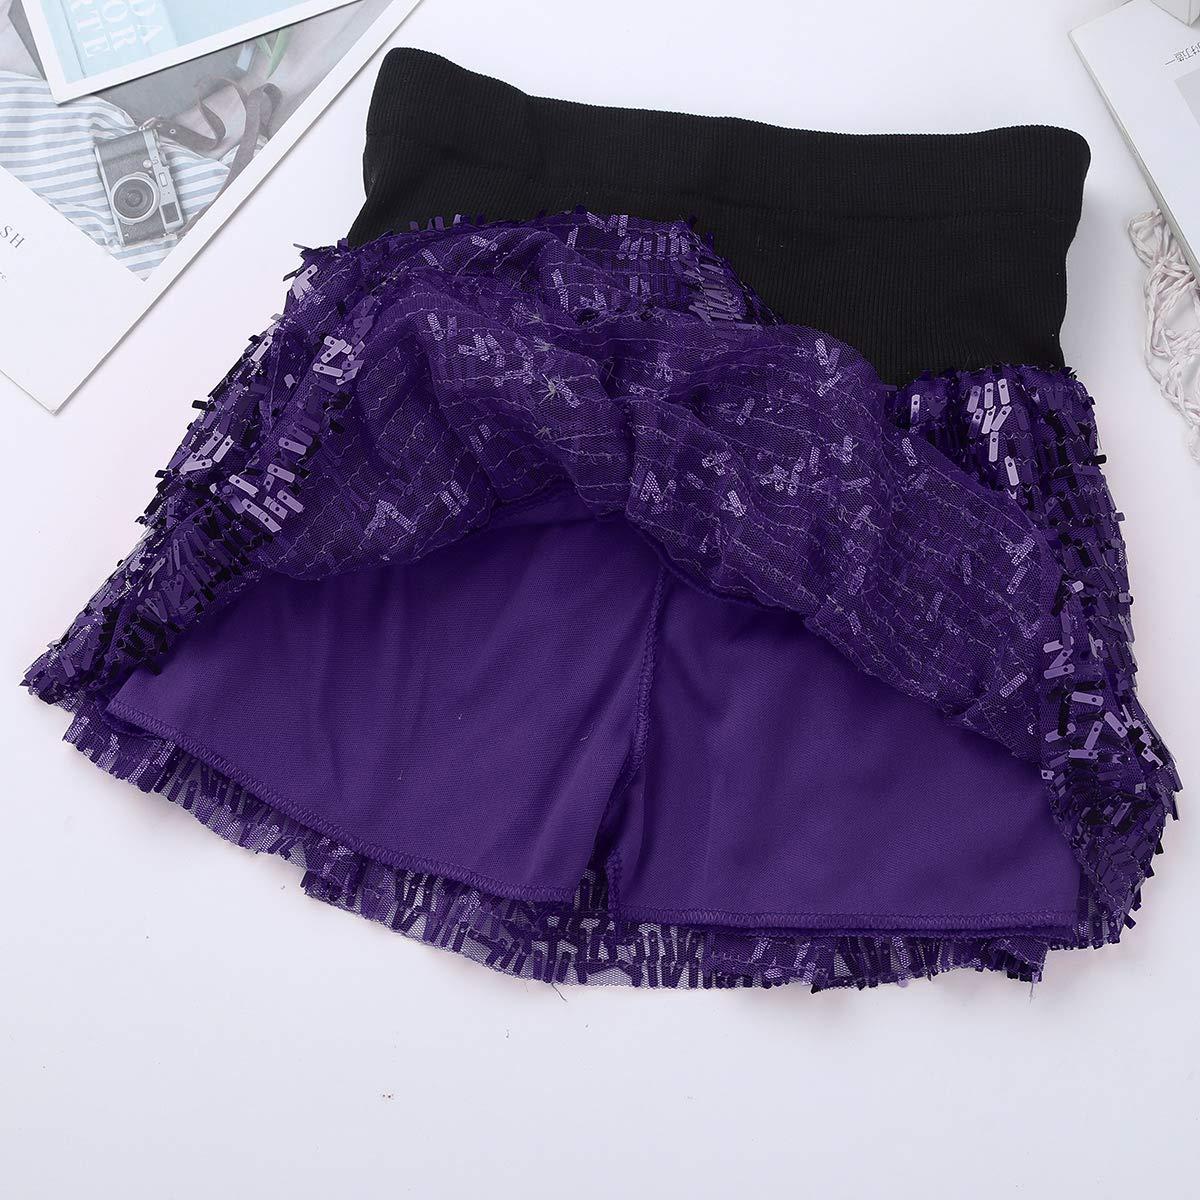 iiniim Women Sparkle Glitter Sequins Running Skirt Race Costume Ballet Tutu Layered Mini Skirt